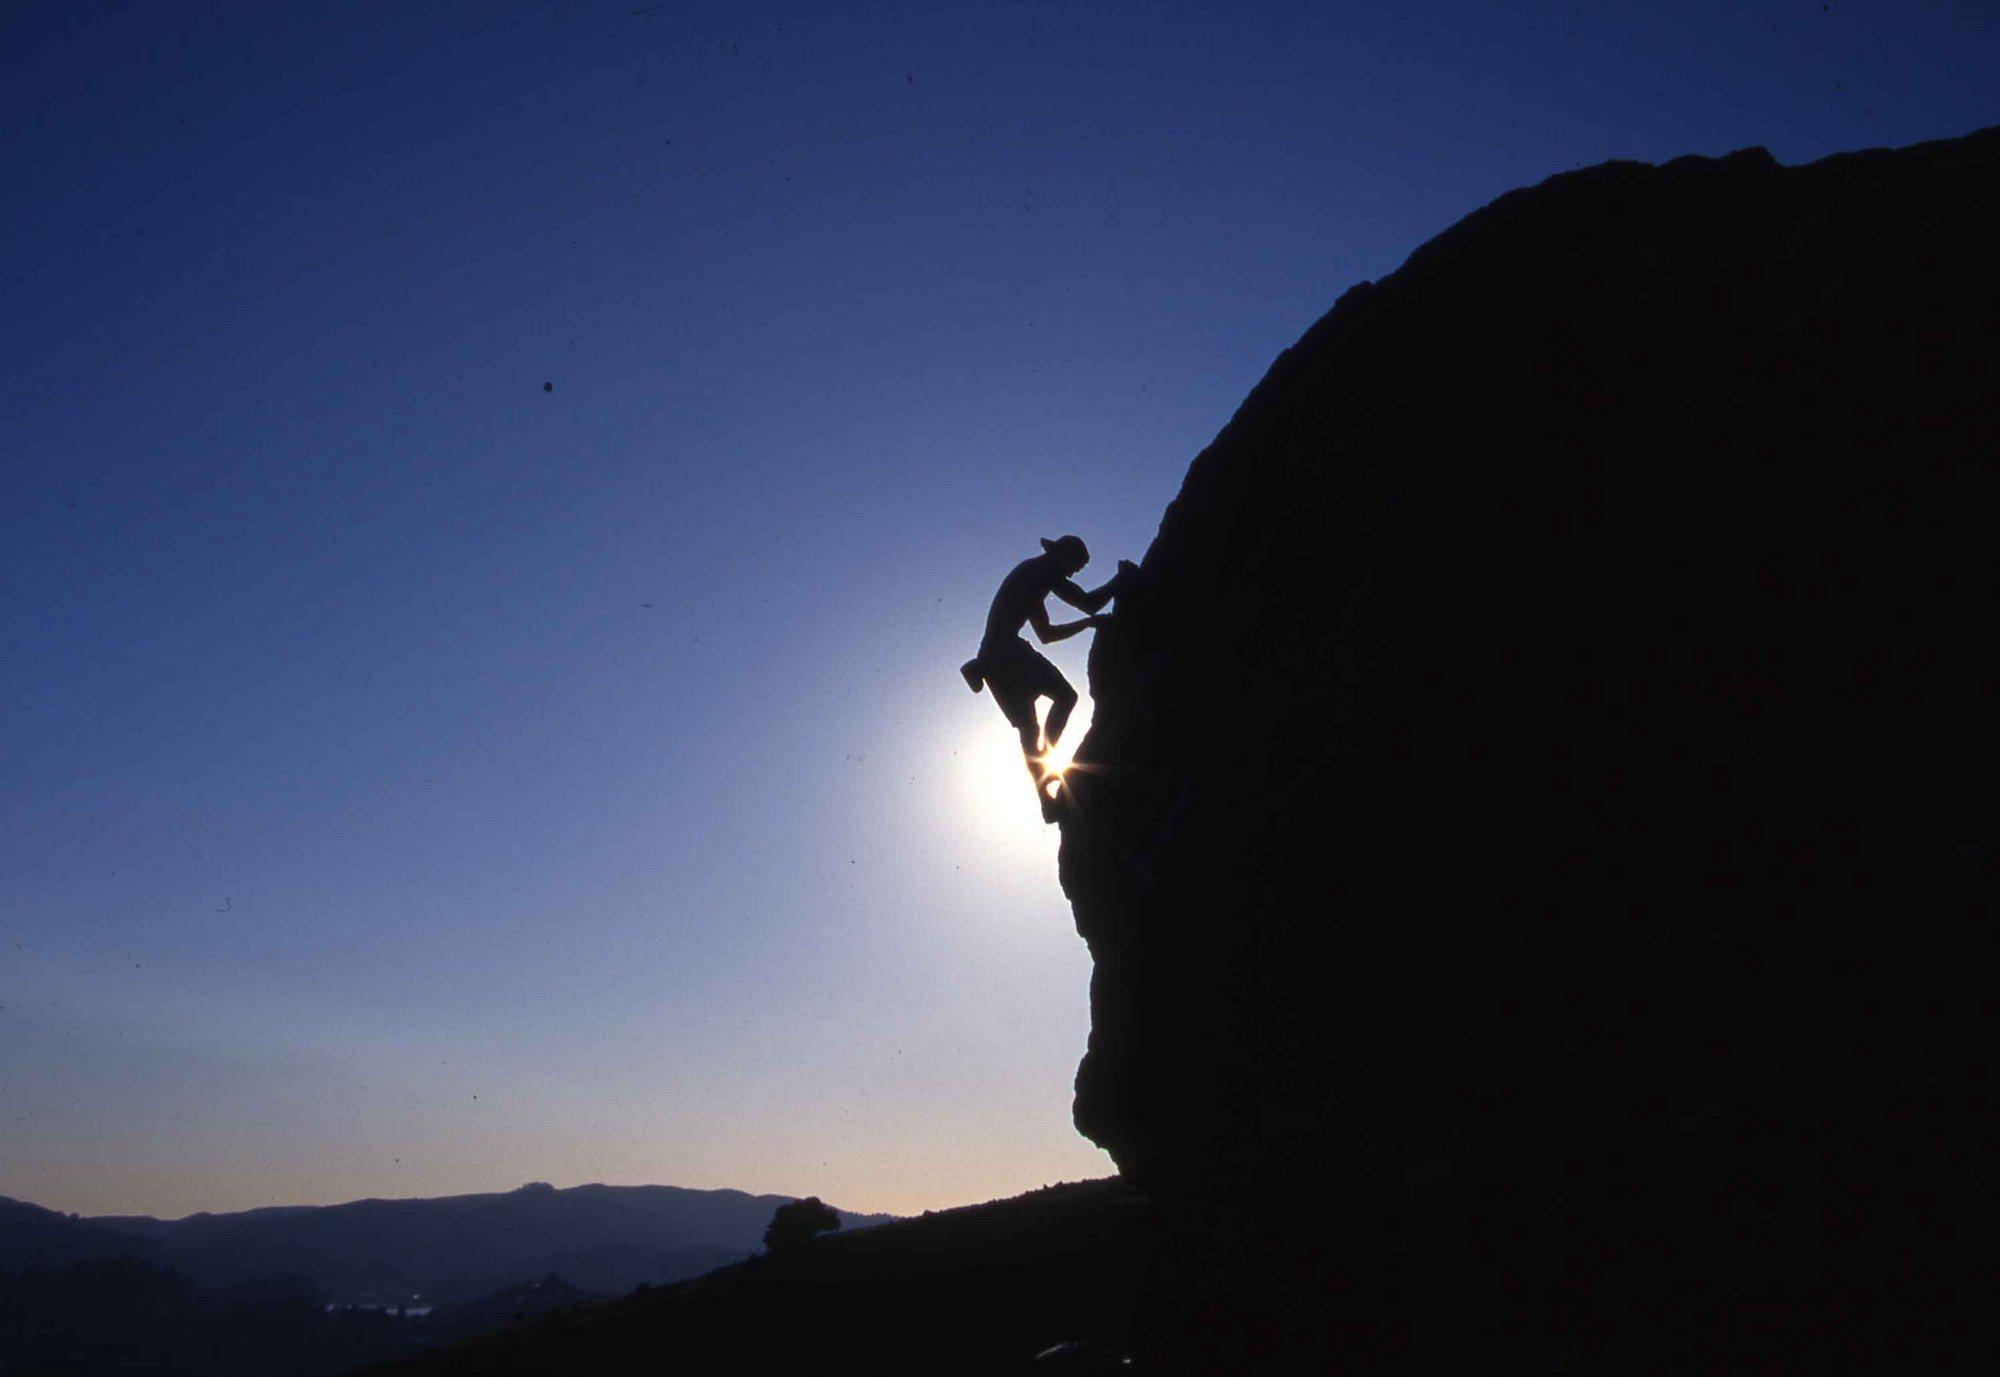 Outdoor Rock Climbing Sunset   www.imgkid.com - The Image ...